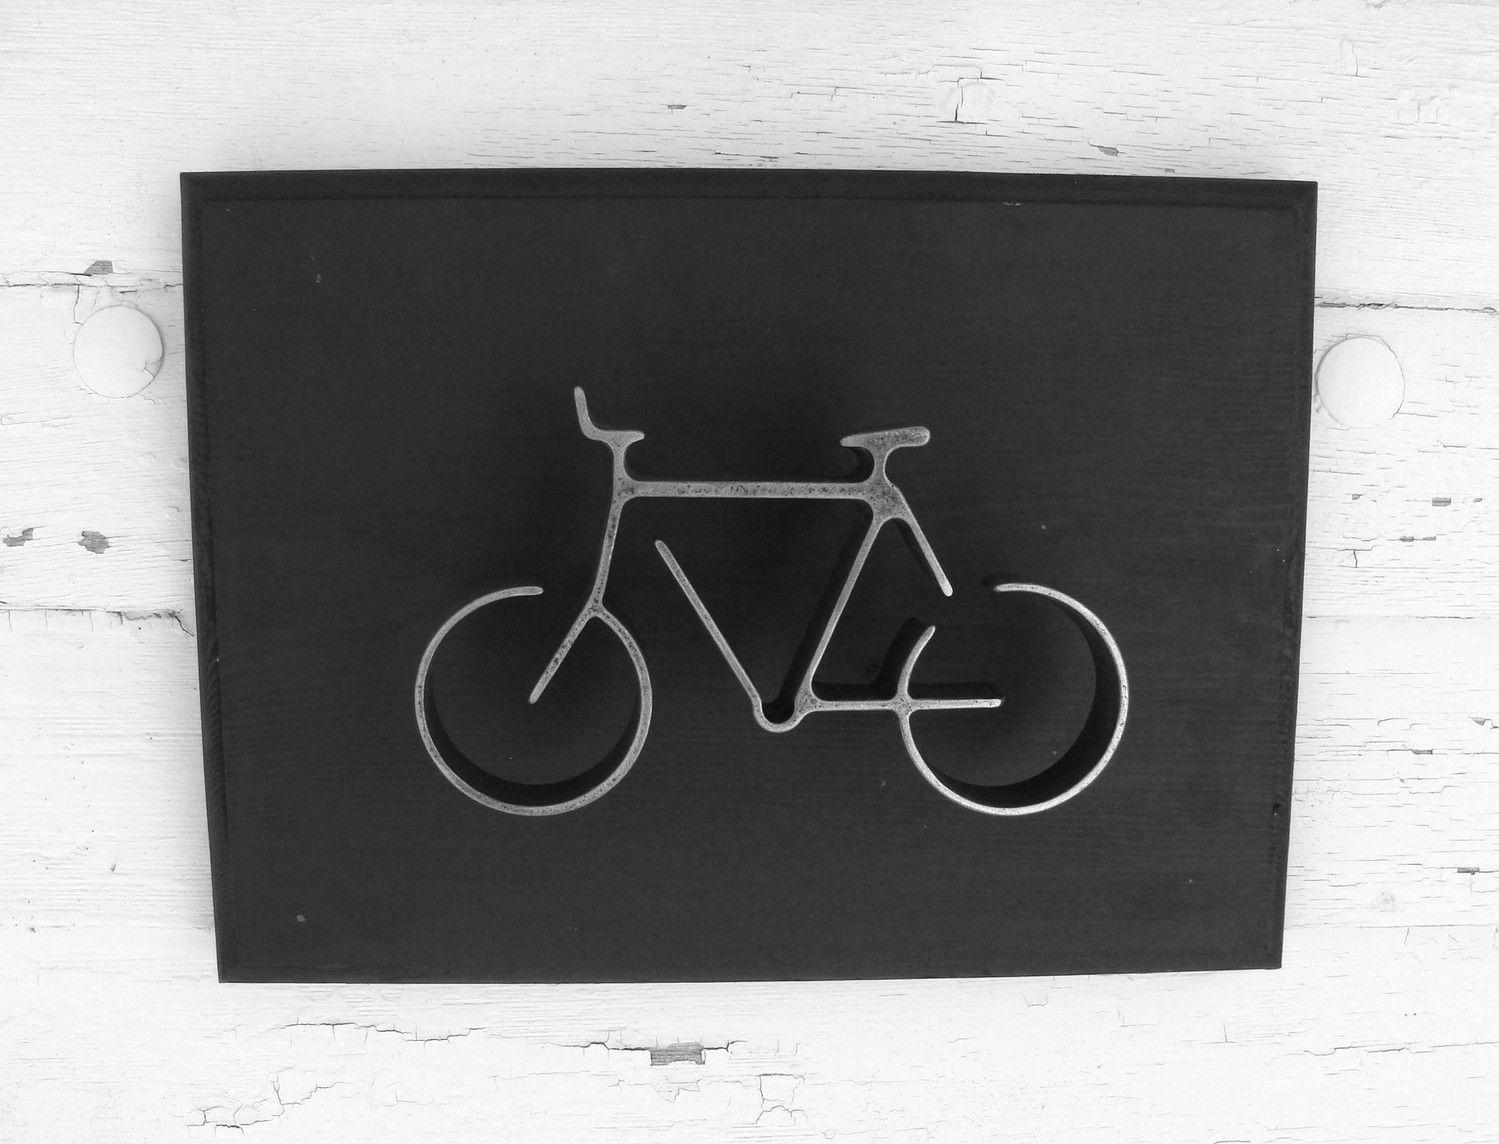 Metal Bike Wall Art Sign Bicycle Hanging Home Or Office Decor Groomsman Gift Modern Black 45 00 Via Etsy